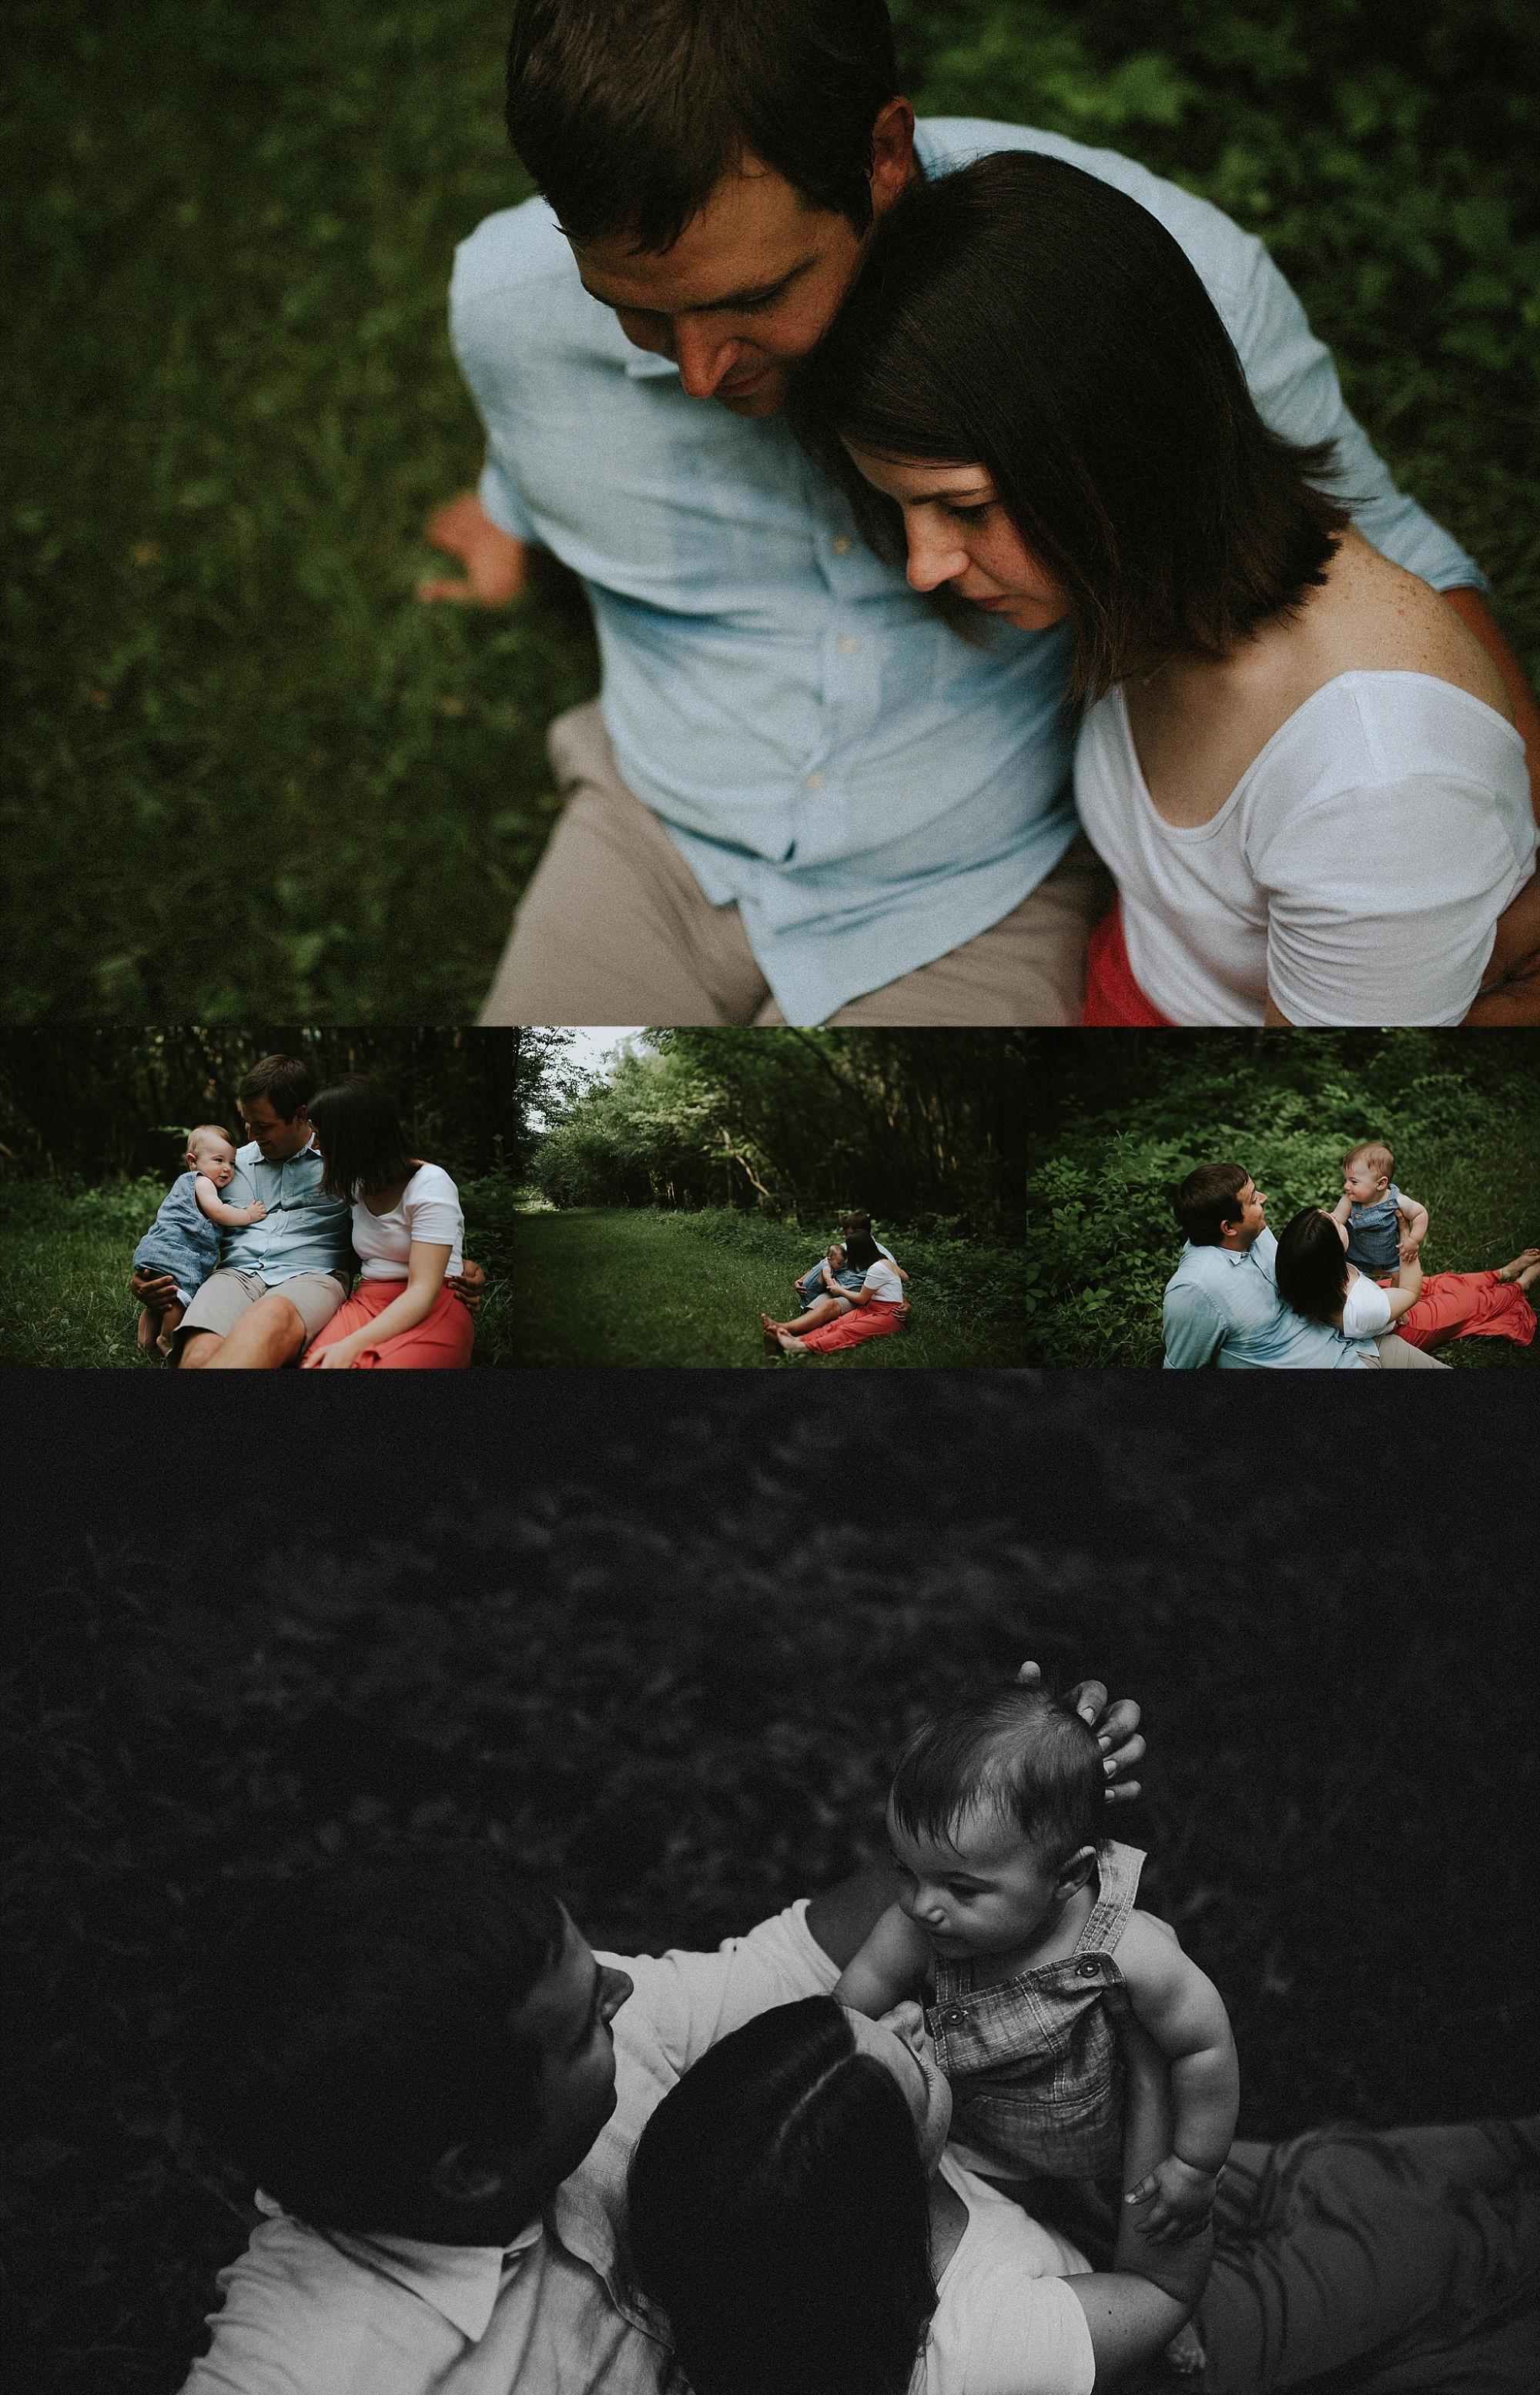 ADRI DE LA CRUZ CHICAGO AND WEST SUBURBS FAMILY PHOTOGRAPHER (5)